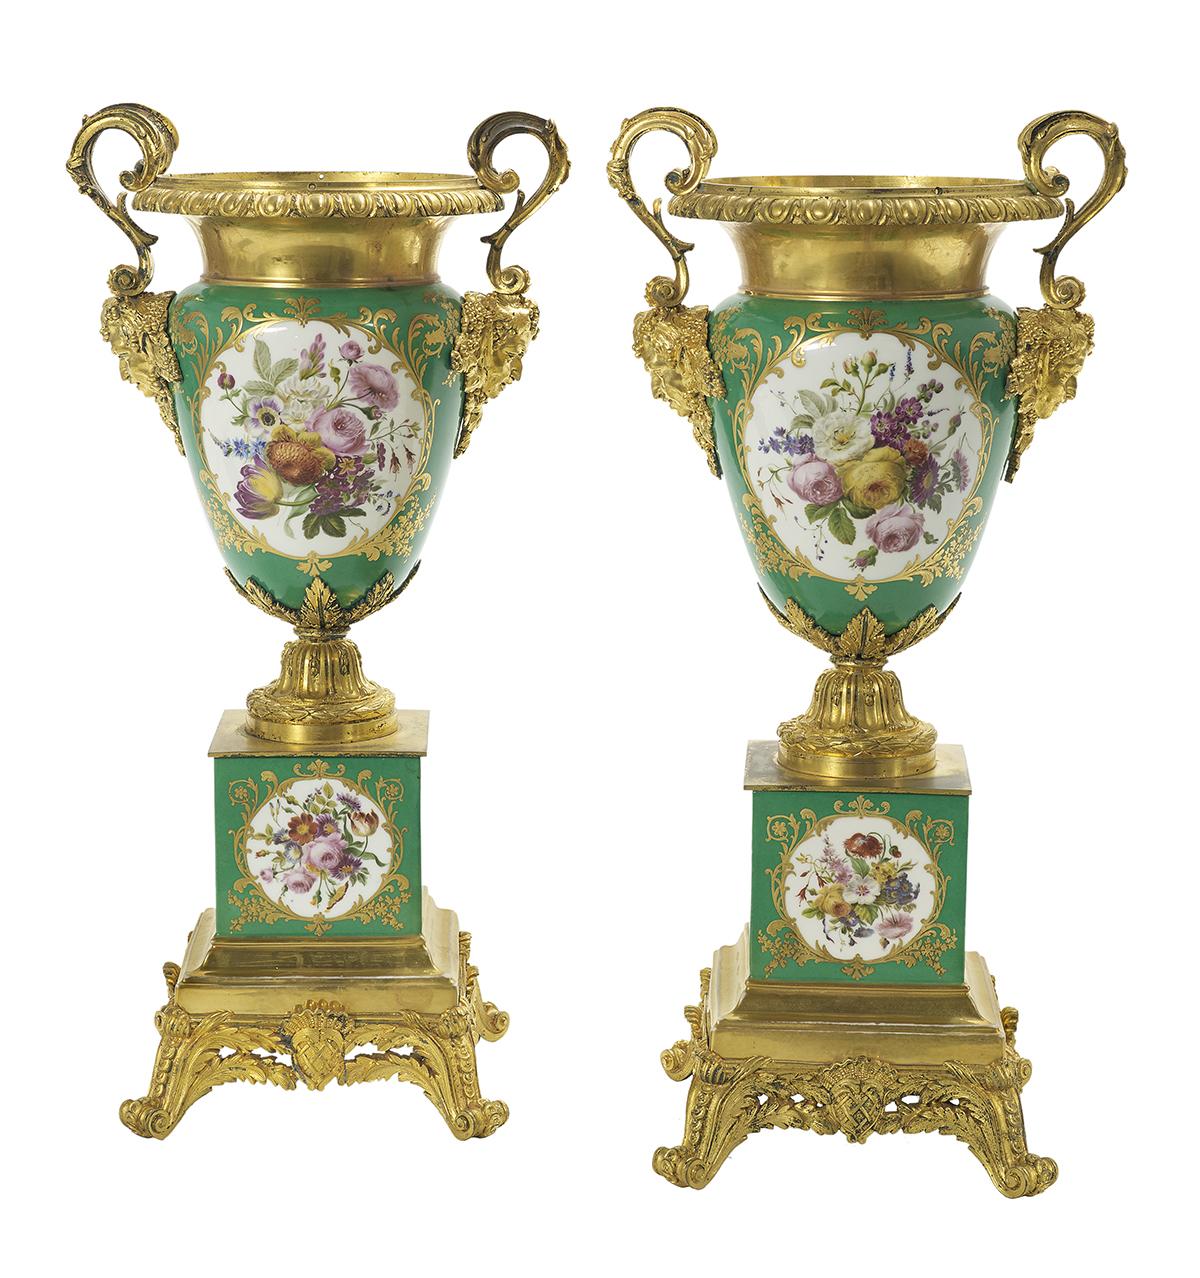 Lot 980 - Pair of Jacob Petit Porcelain and Ormolu Vases